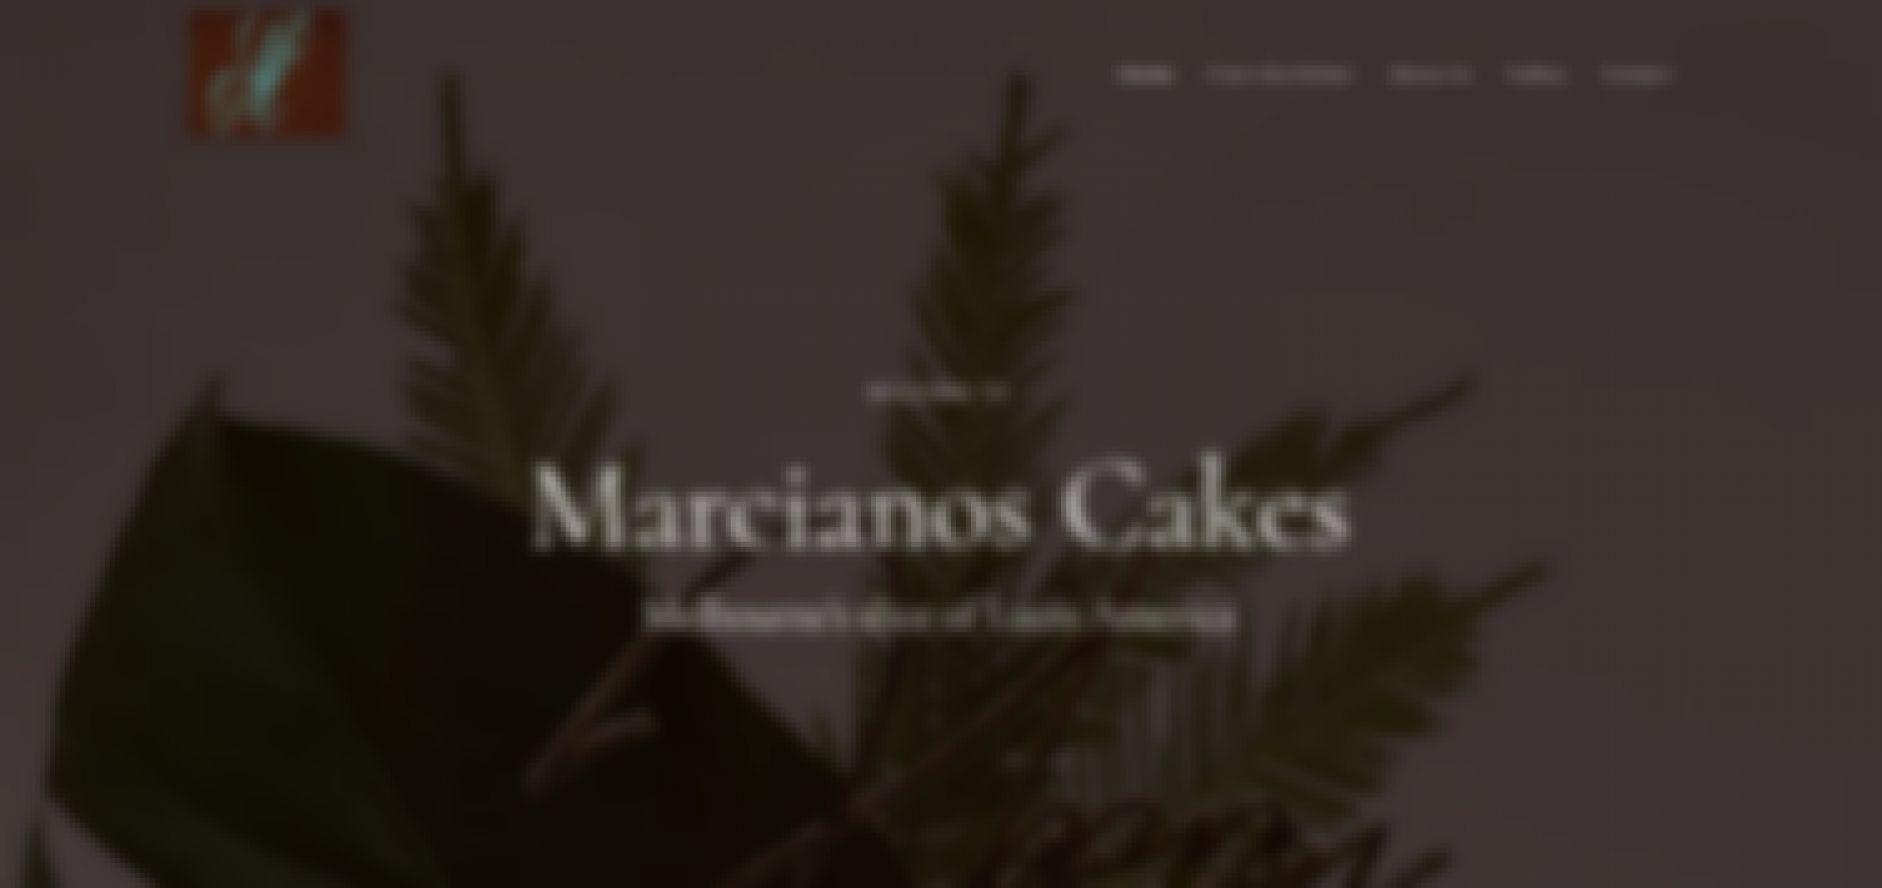 marcianos cakes